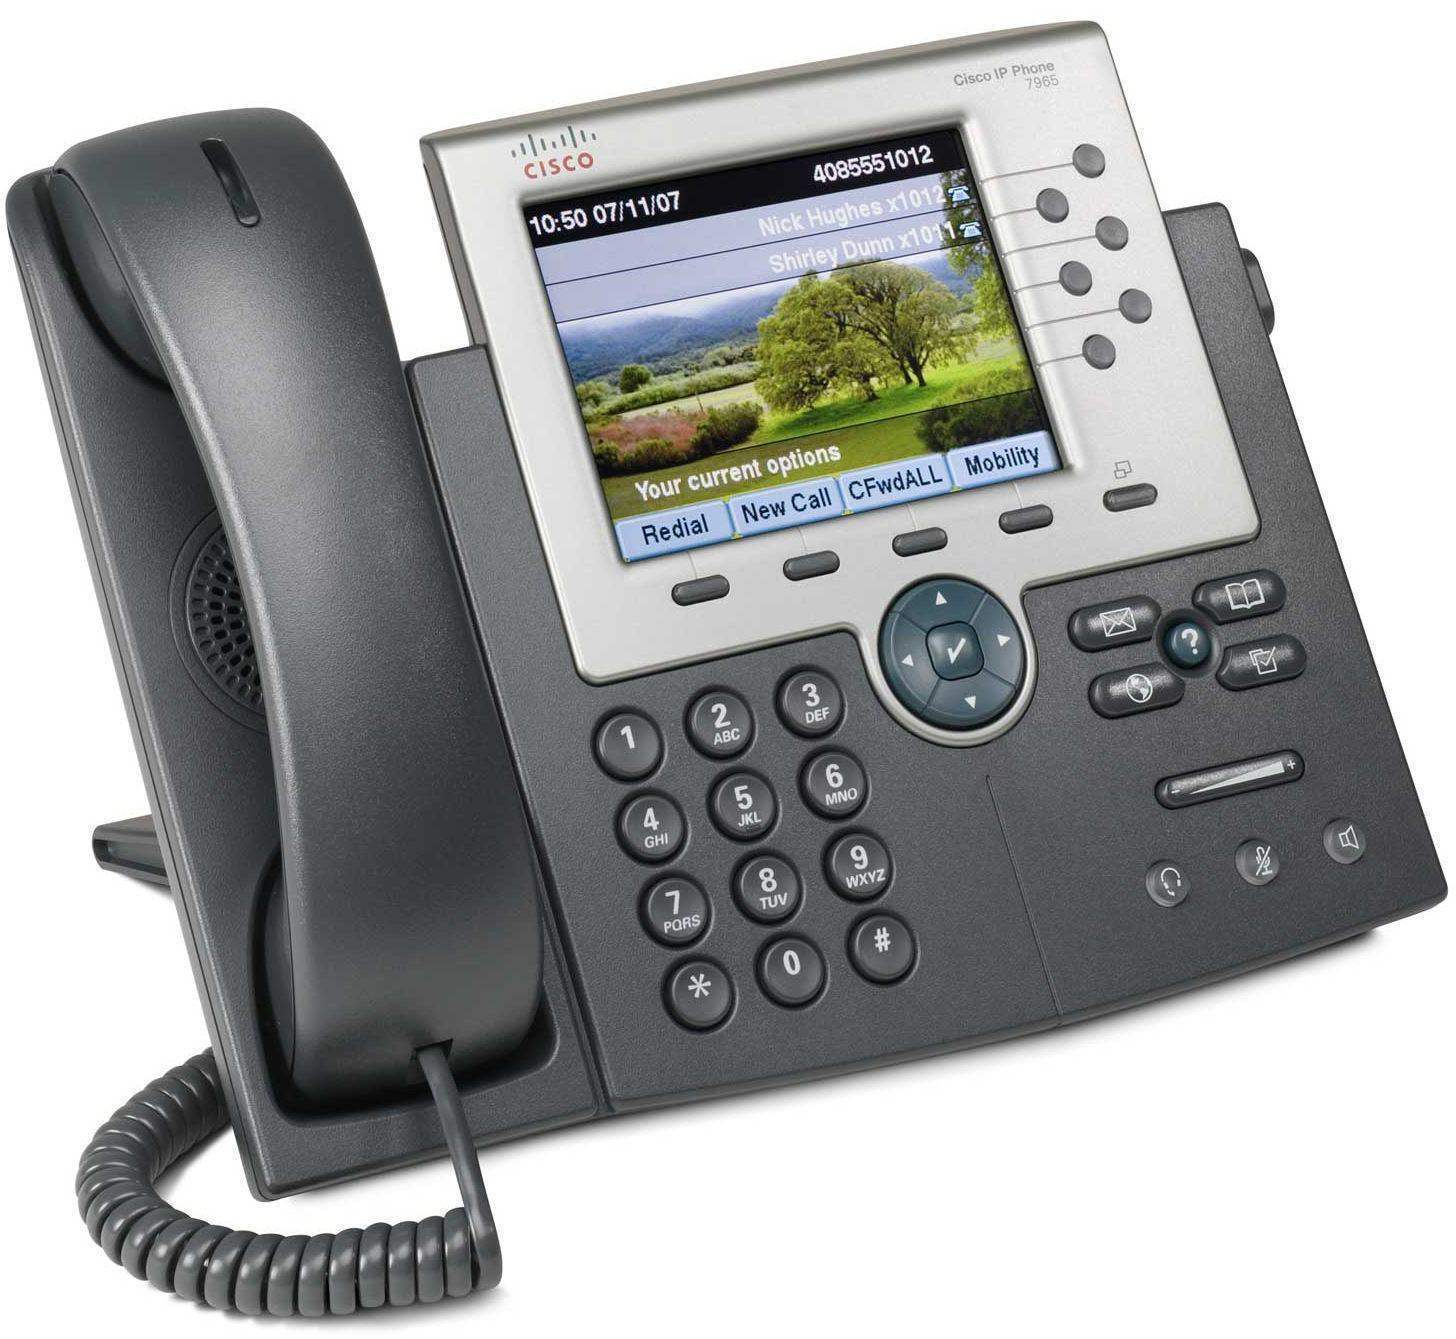 آی پی فون سیسکو 7965G,تلفن سیسکو 7965G,سیسکو 7965G,تلفن IP سیسکو 7965